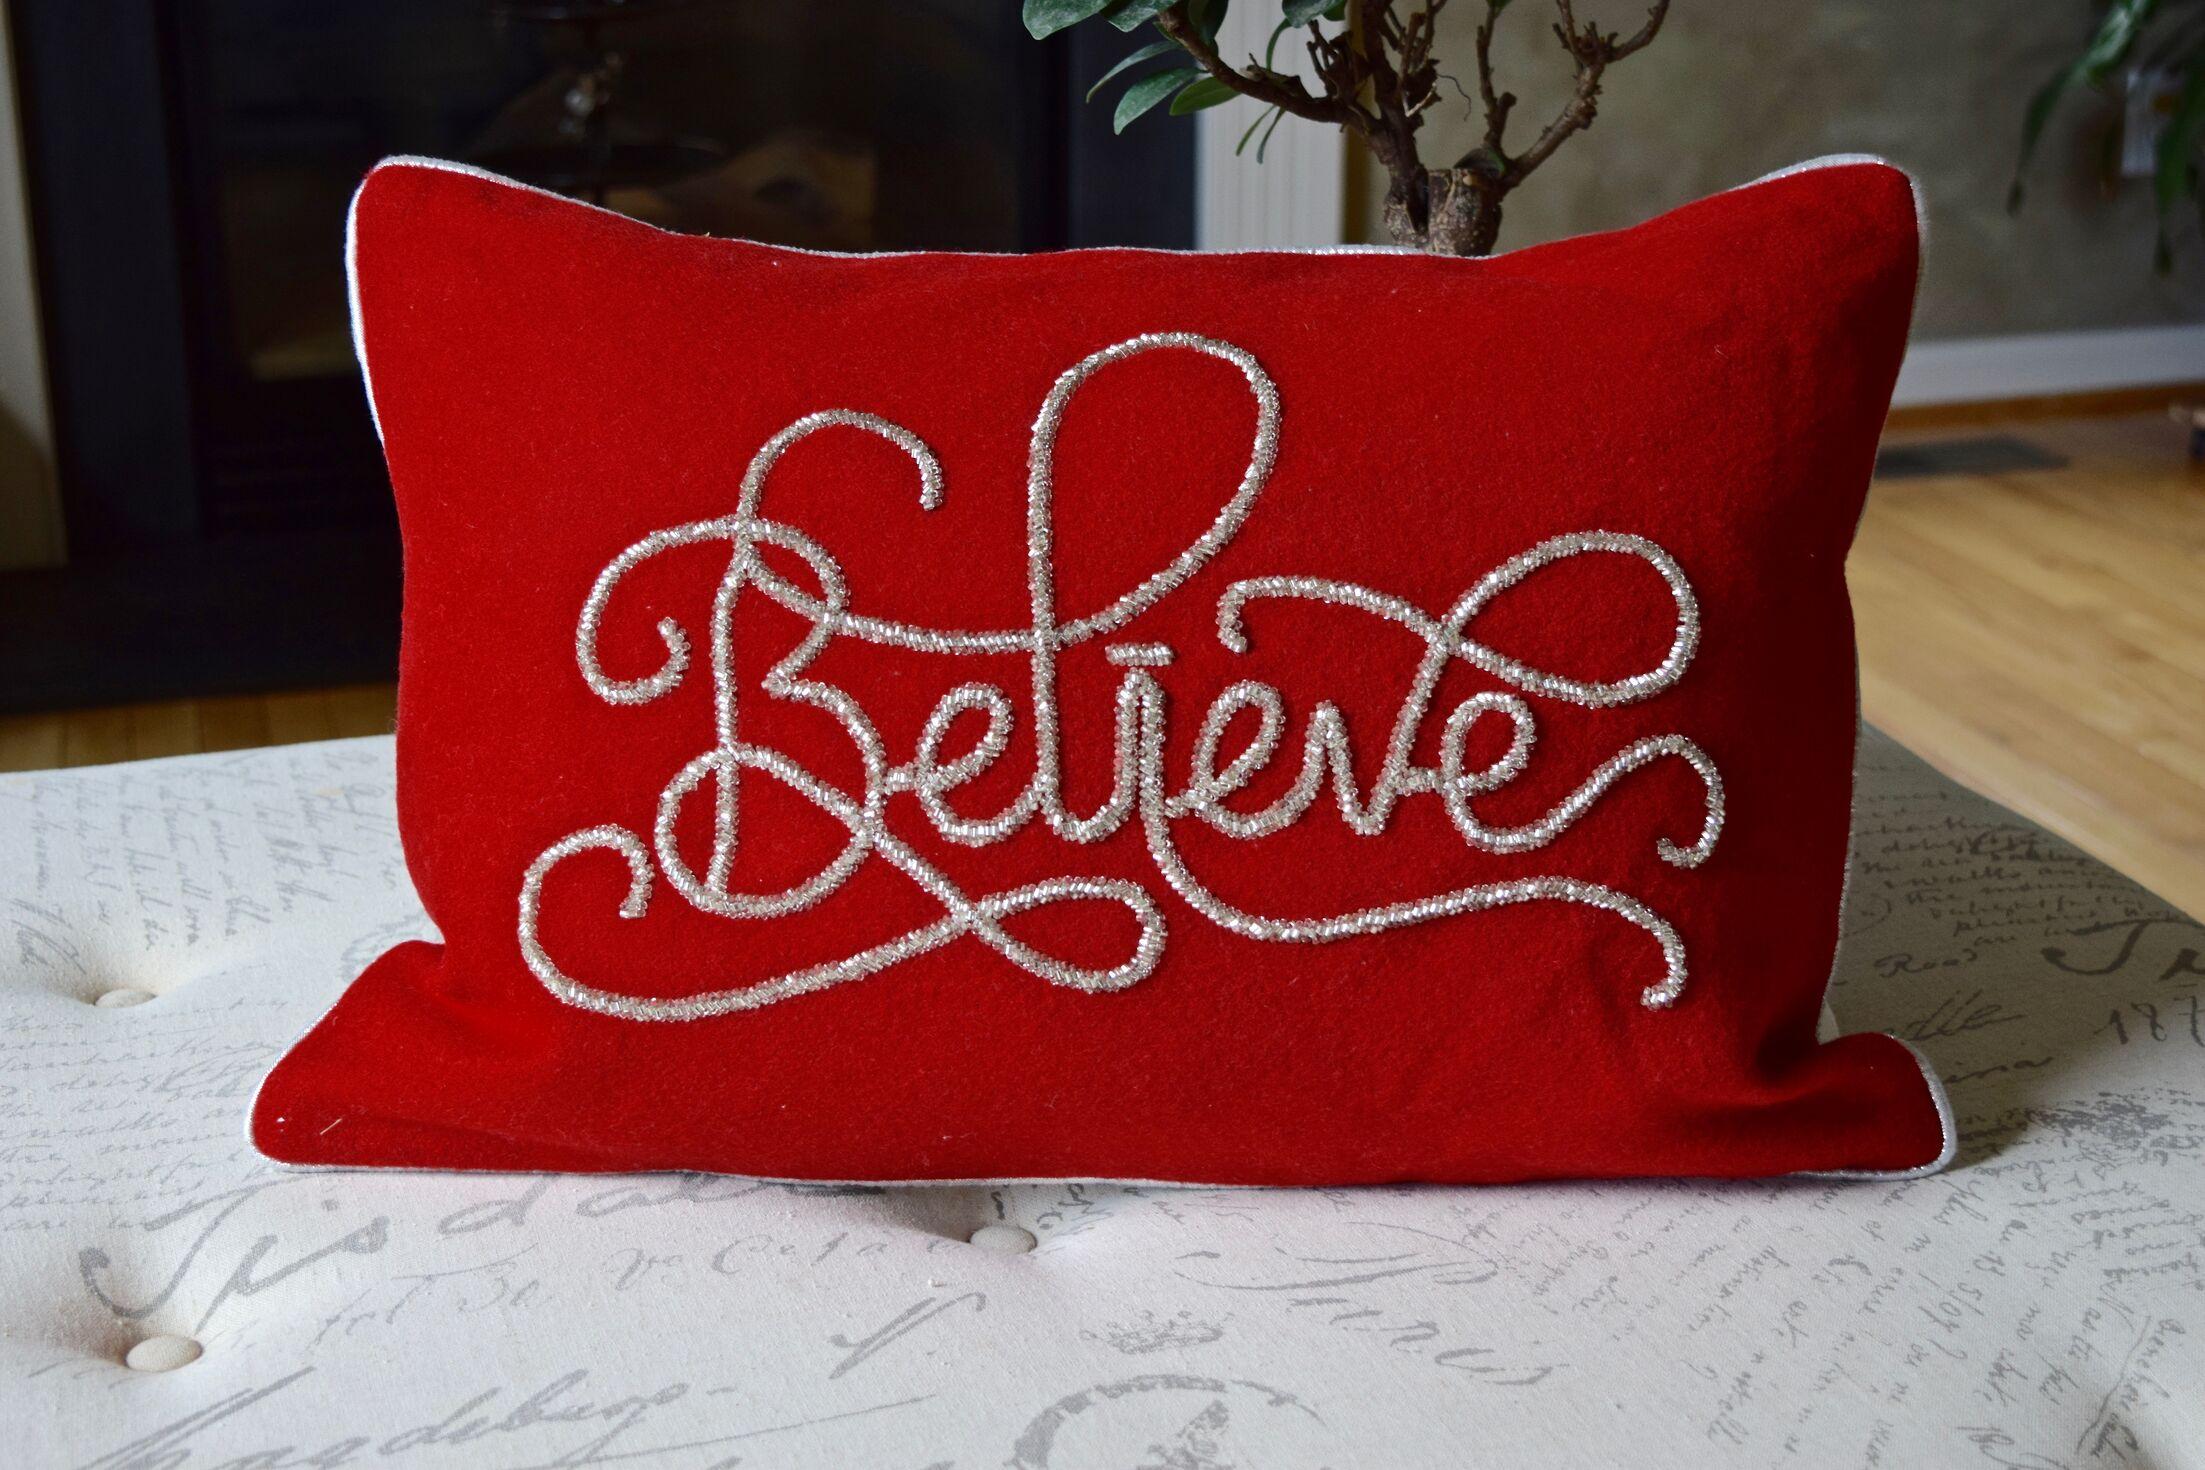 Hera Nothing Like Christmas Lumbar Pillow